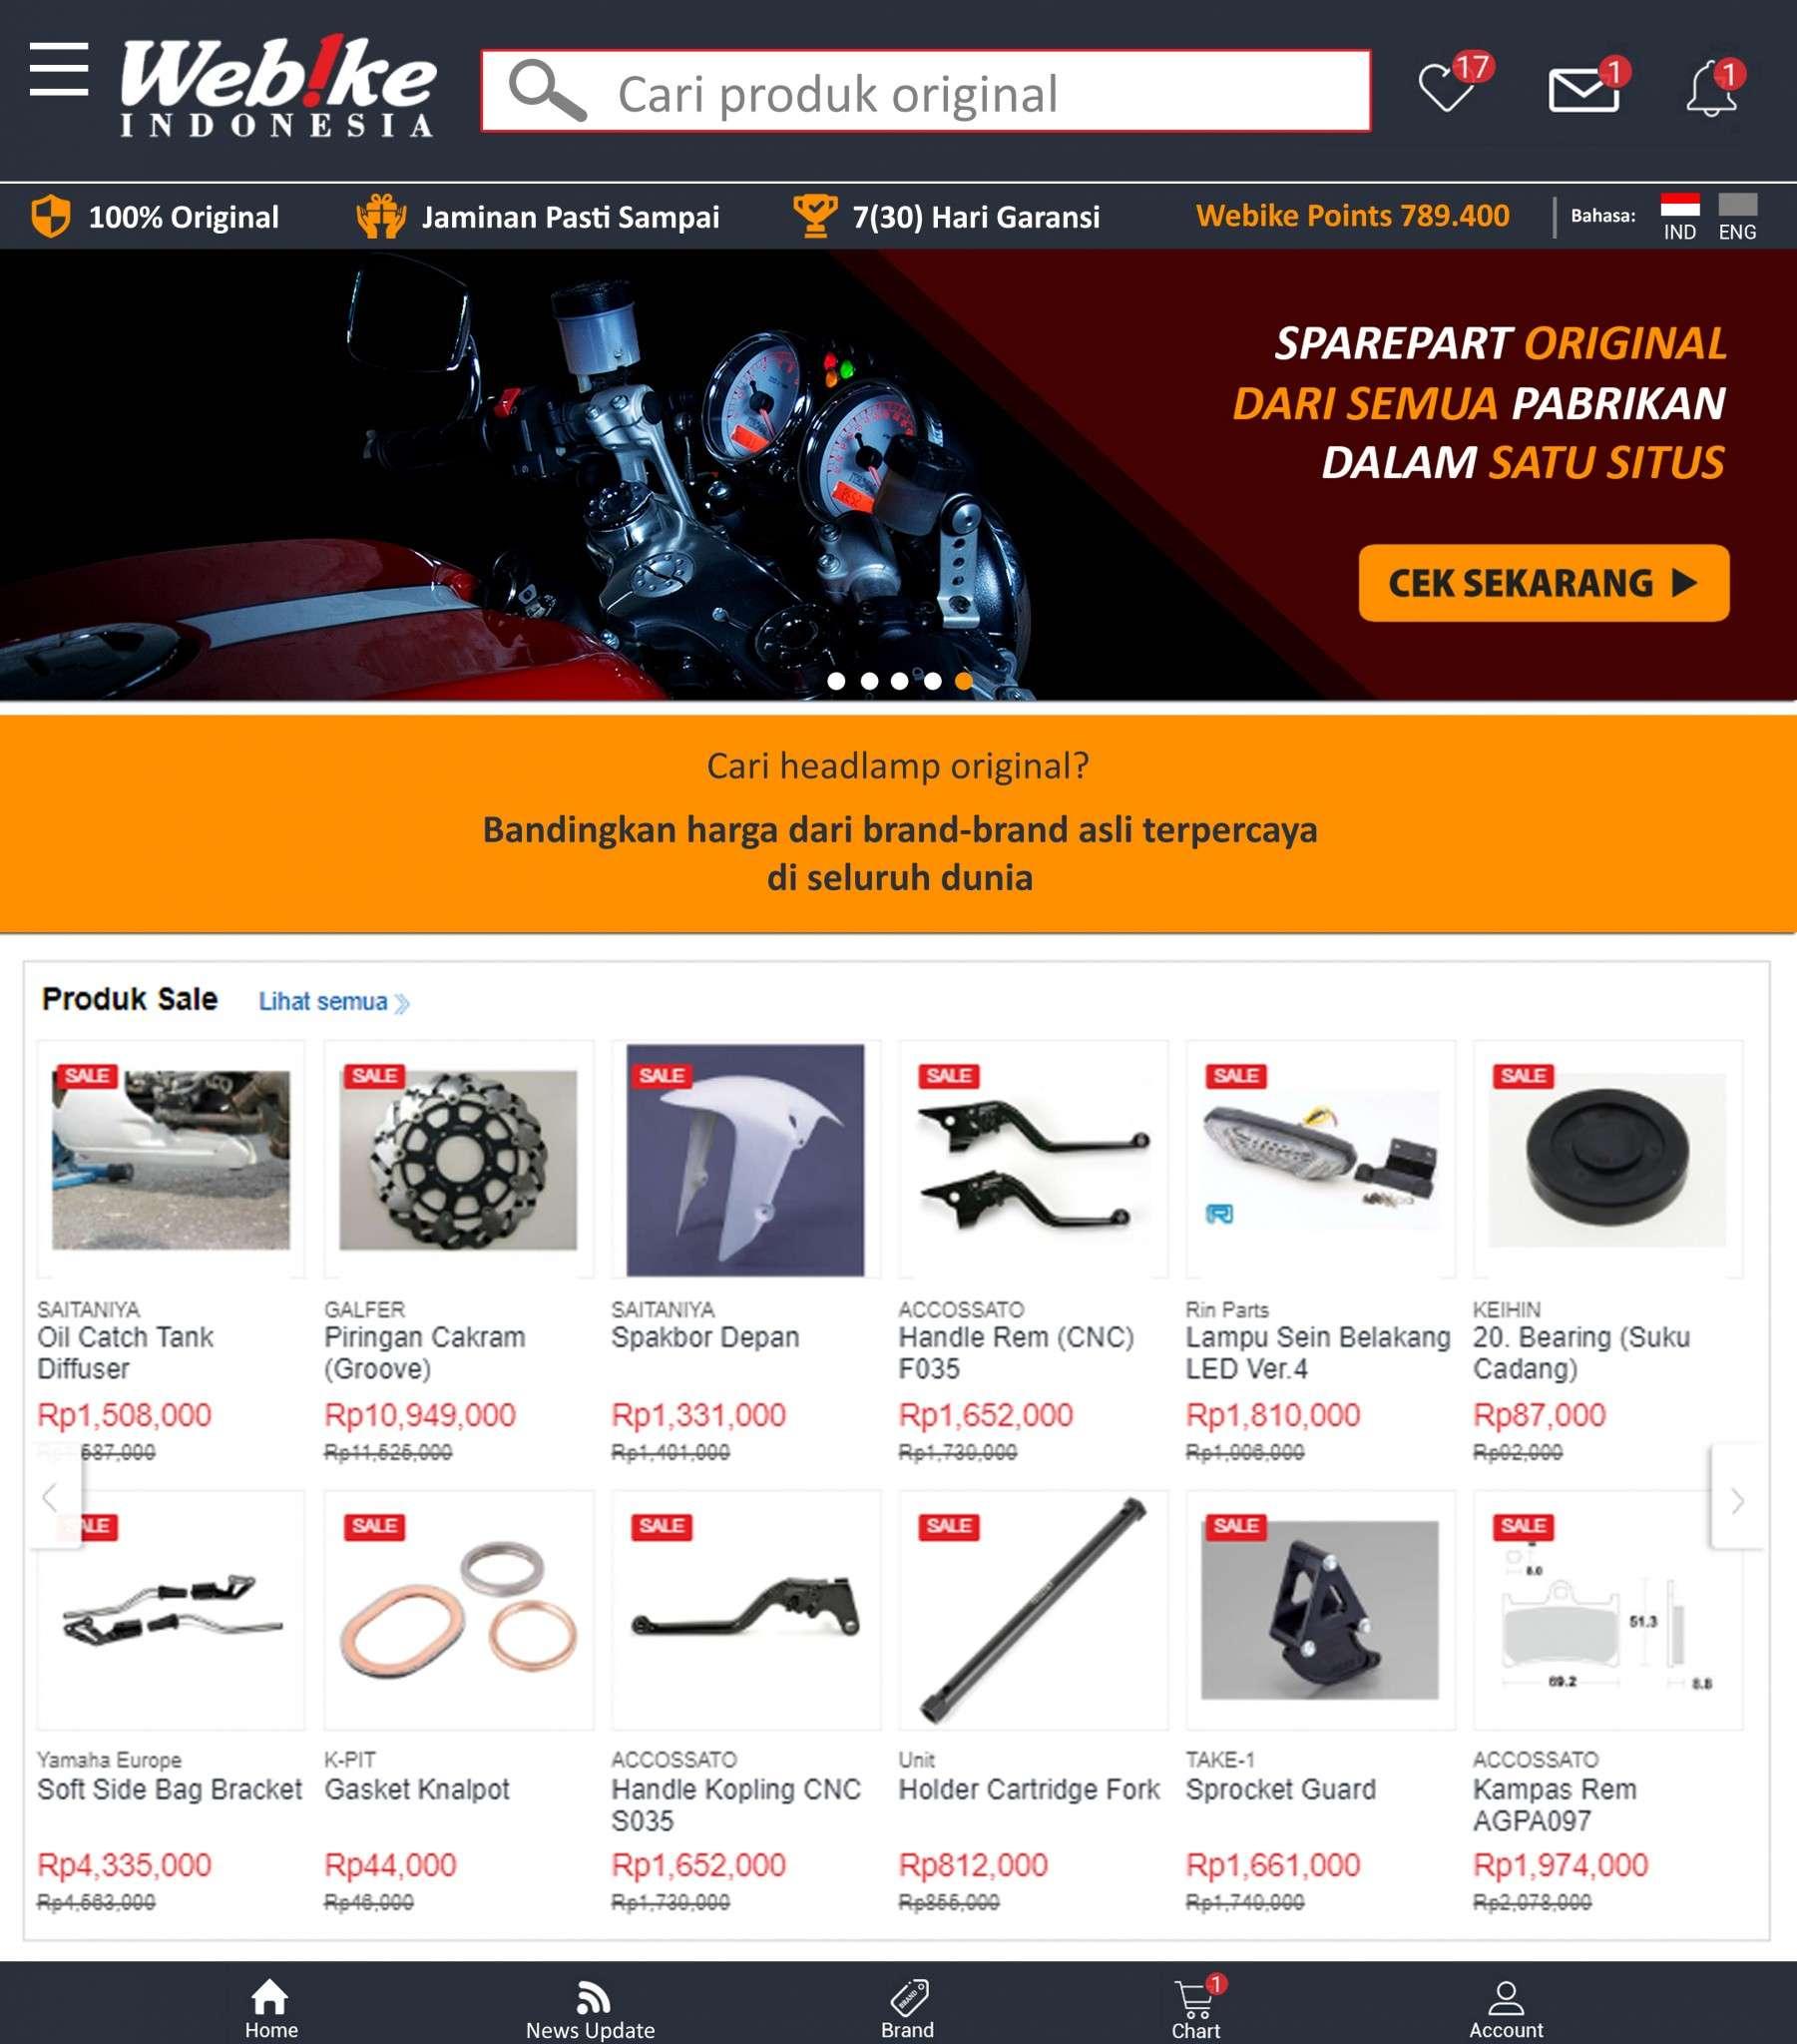 promo sparepart motor & aksesoris berkendara webike indonesia